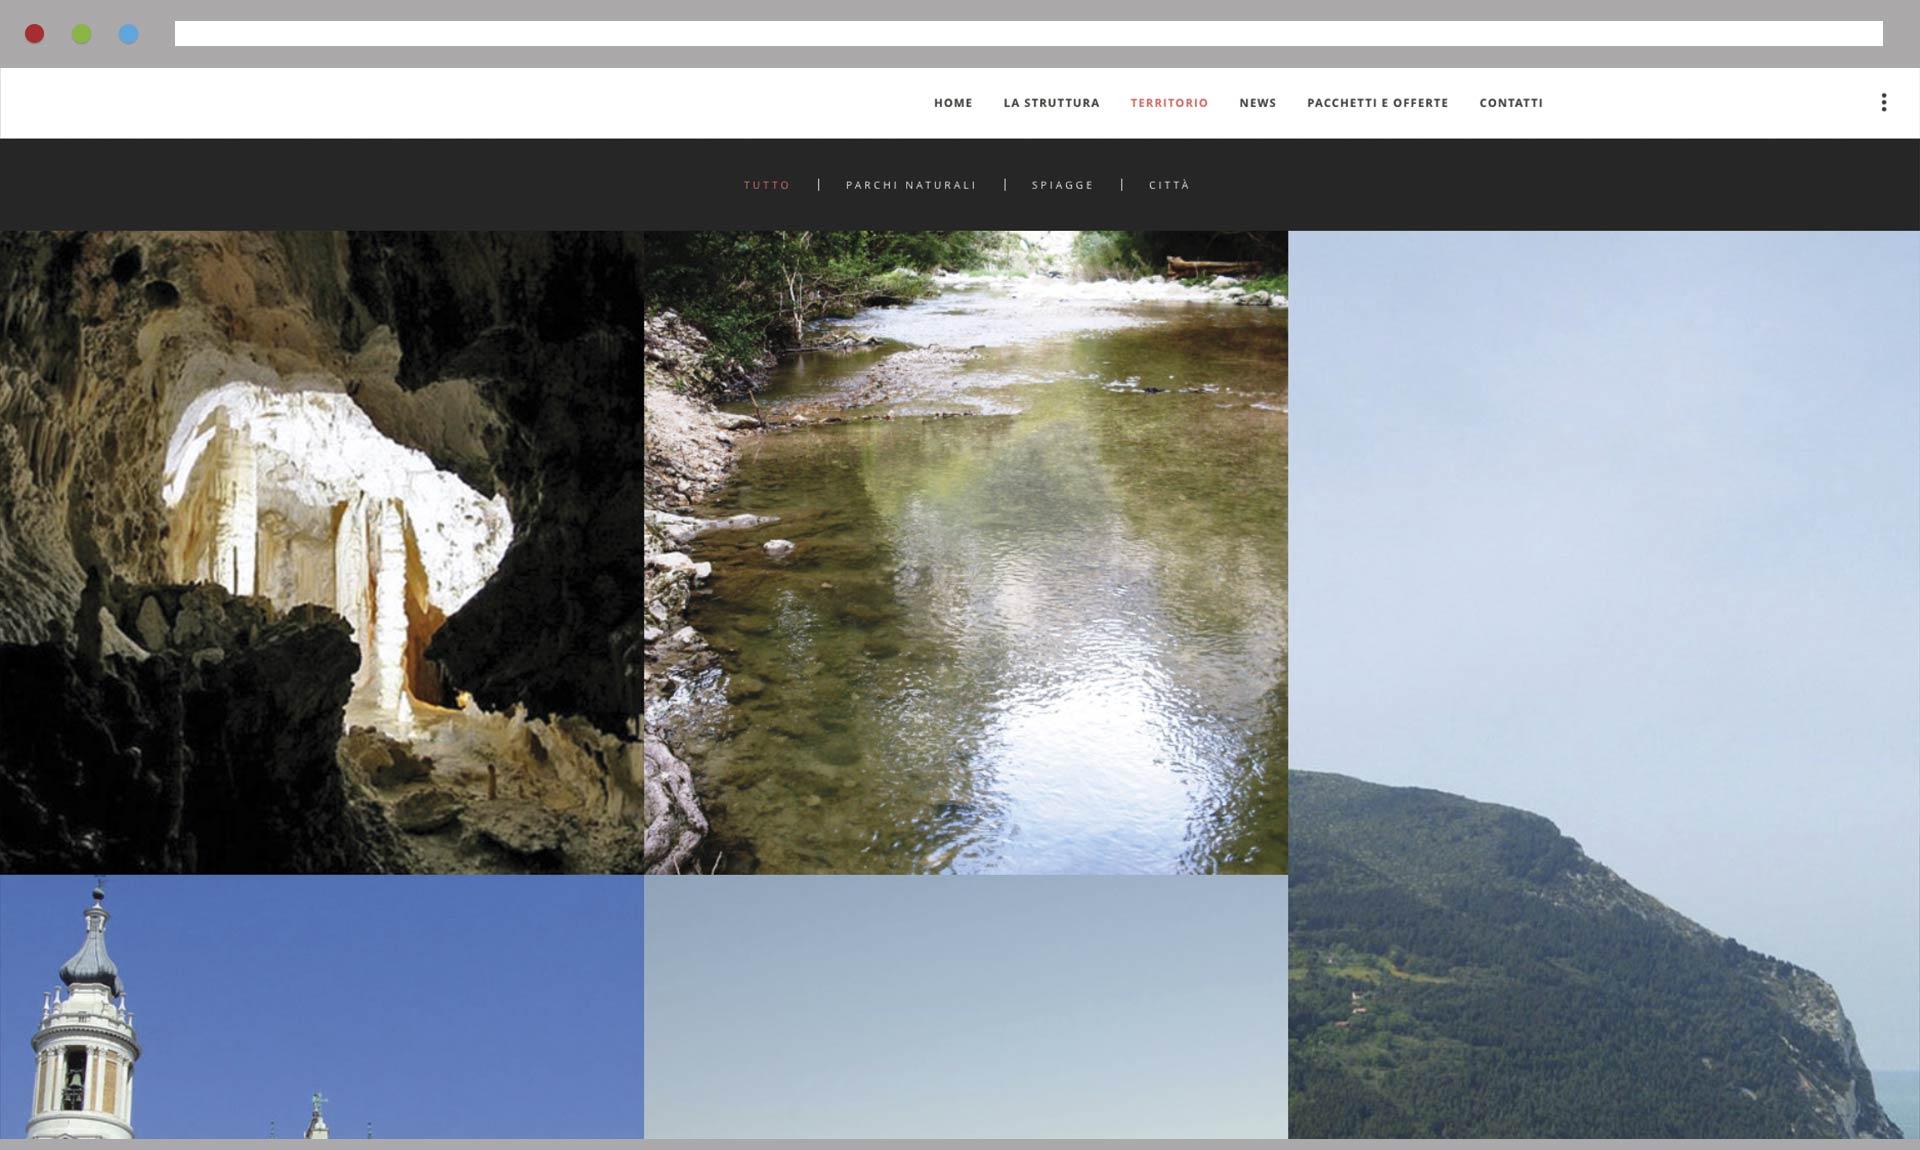 Subwaylab-Sito-Silente-screenshot01